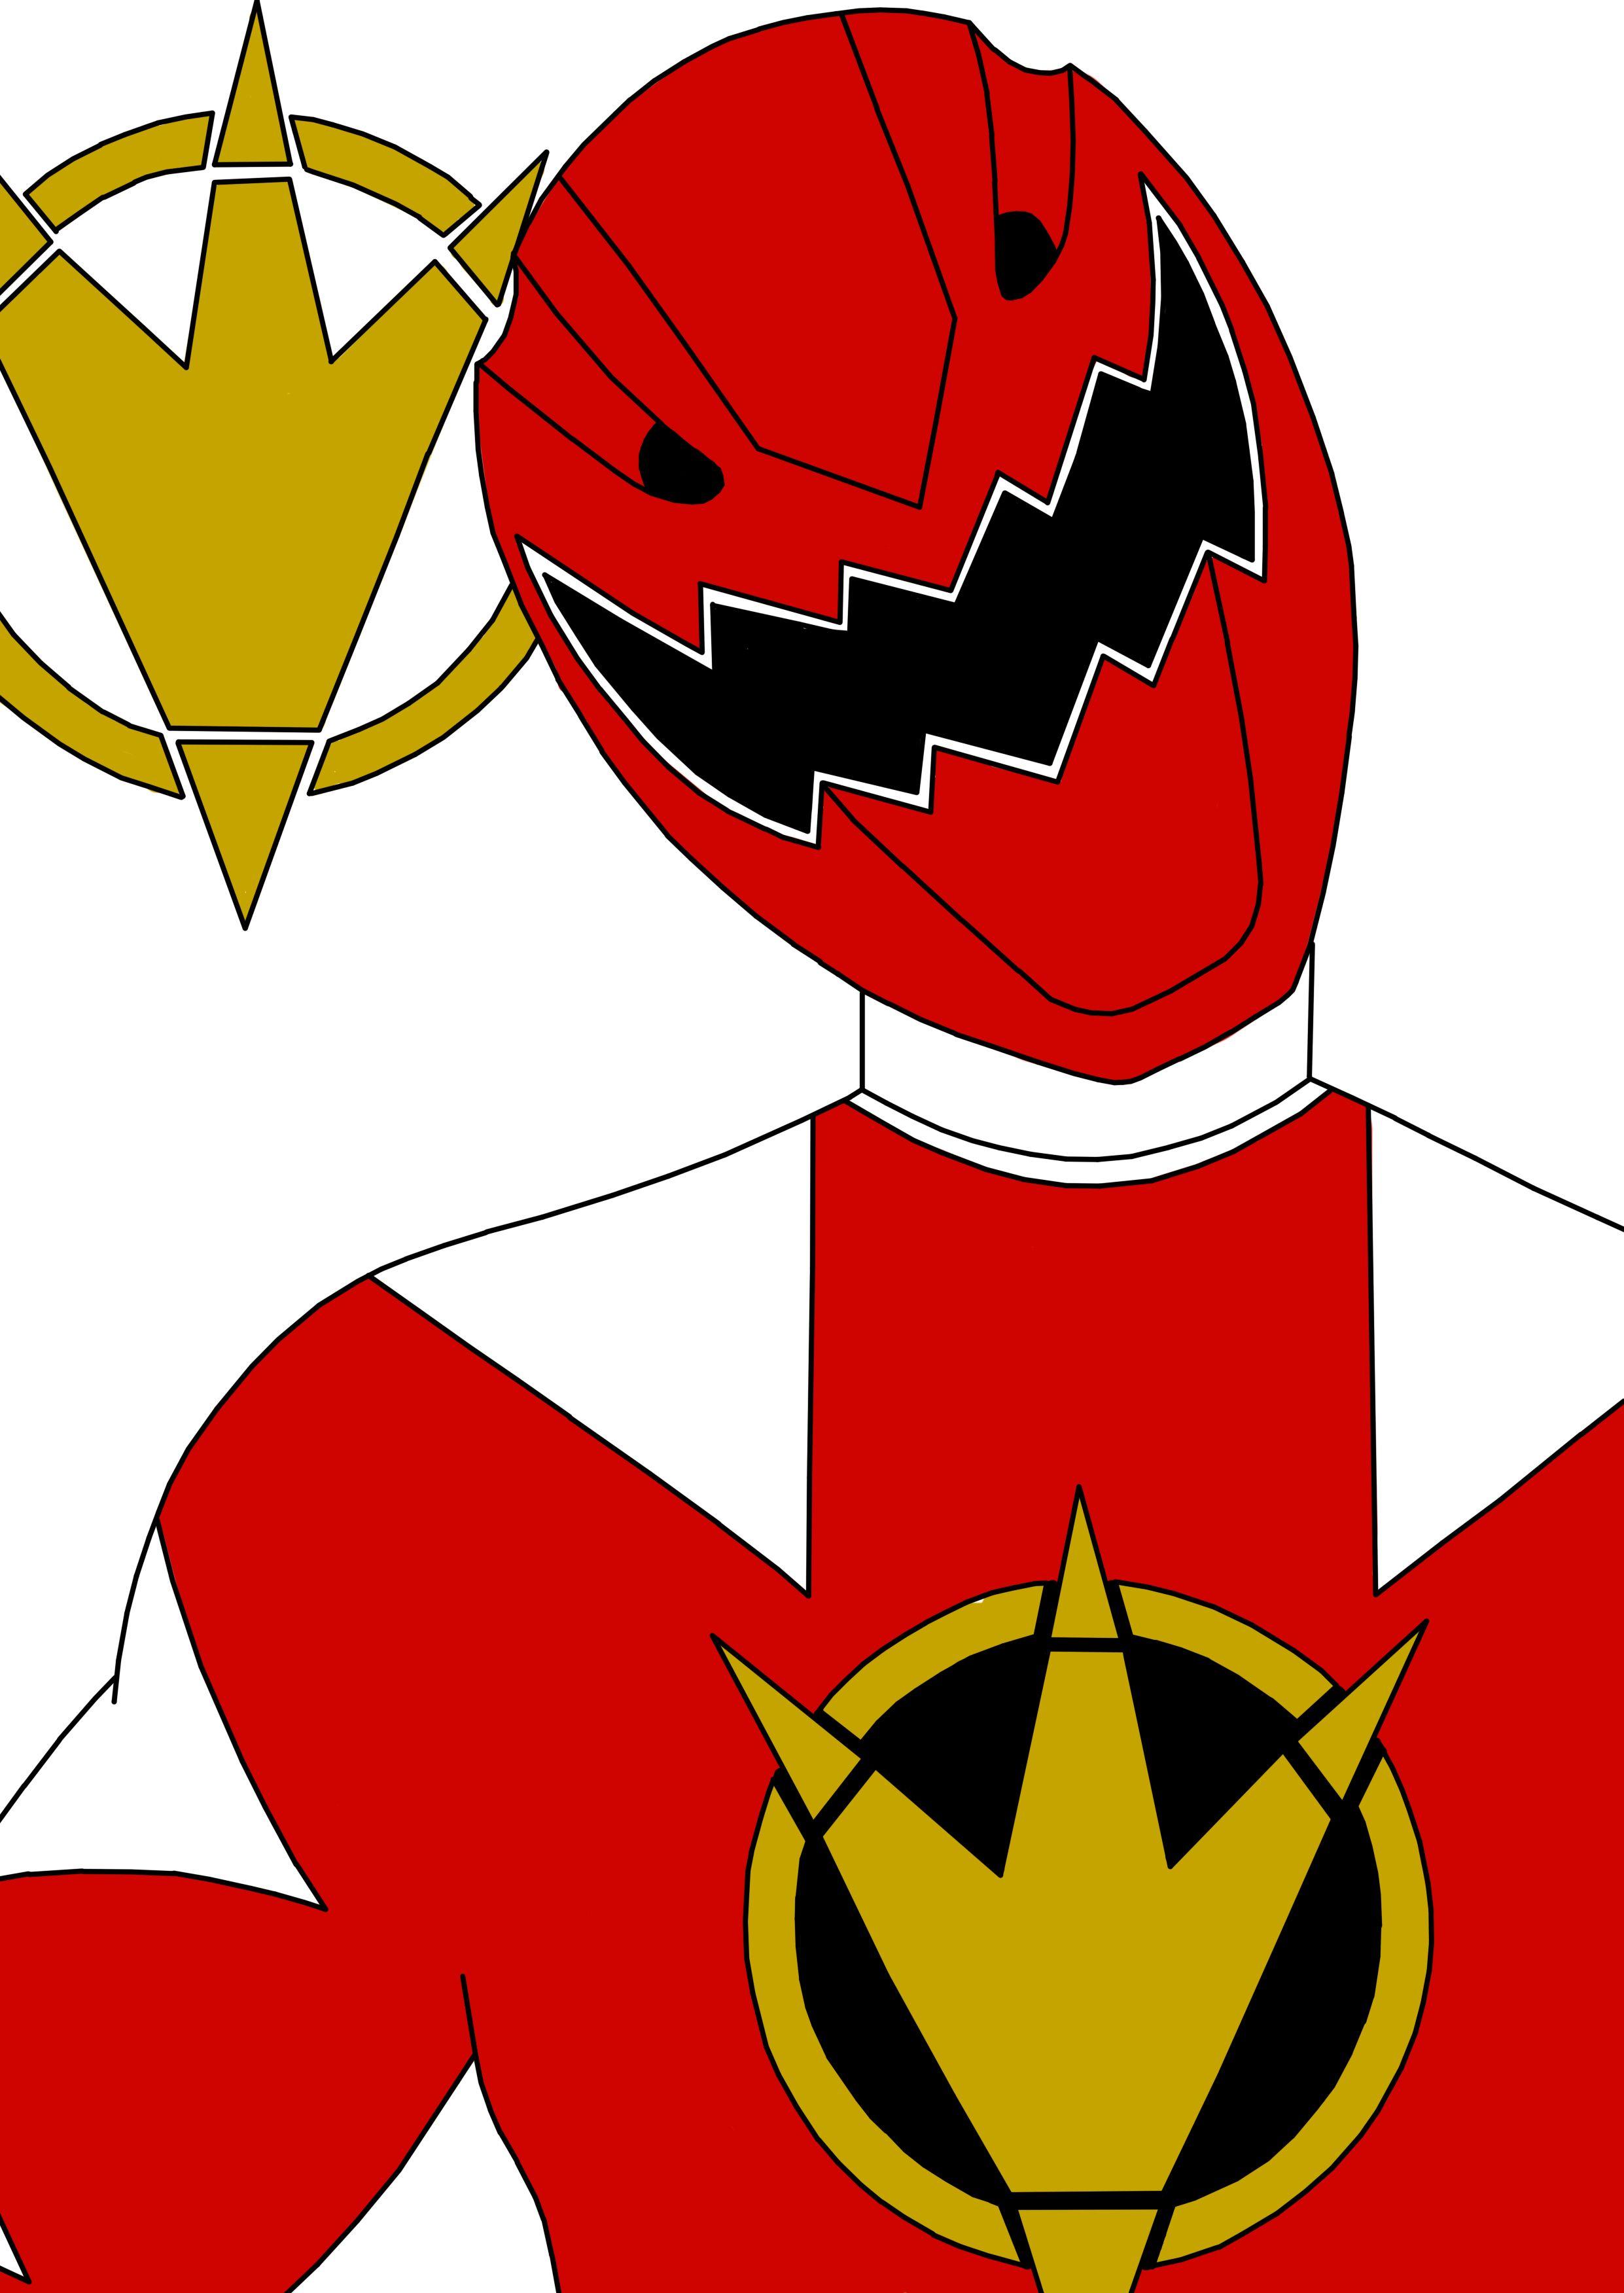 Red Dino Thunder Ranger By Septimusparker On Deviantart Ranger Power Rangers Dino Thunder